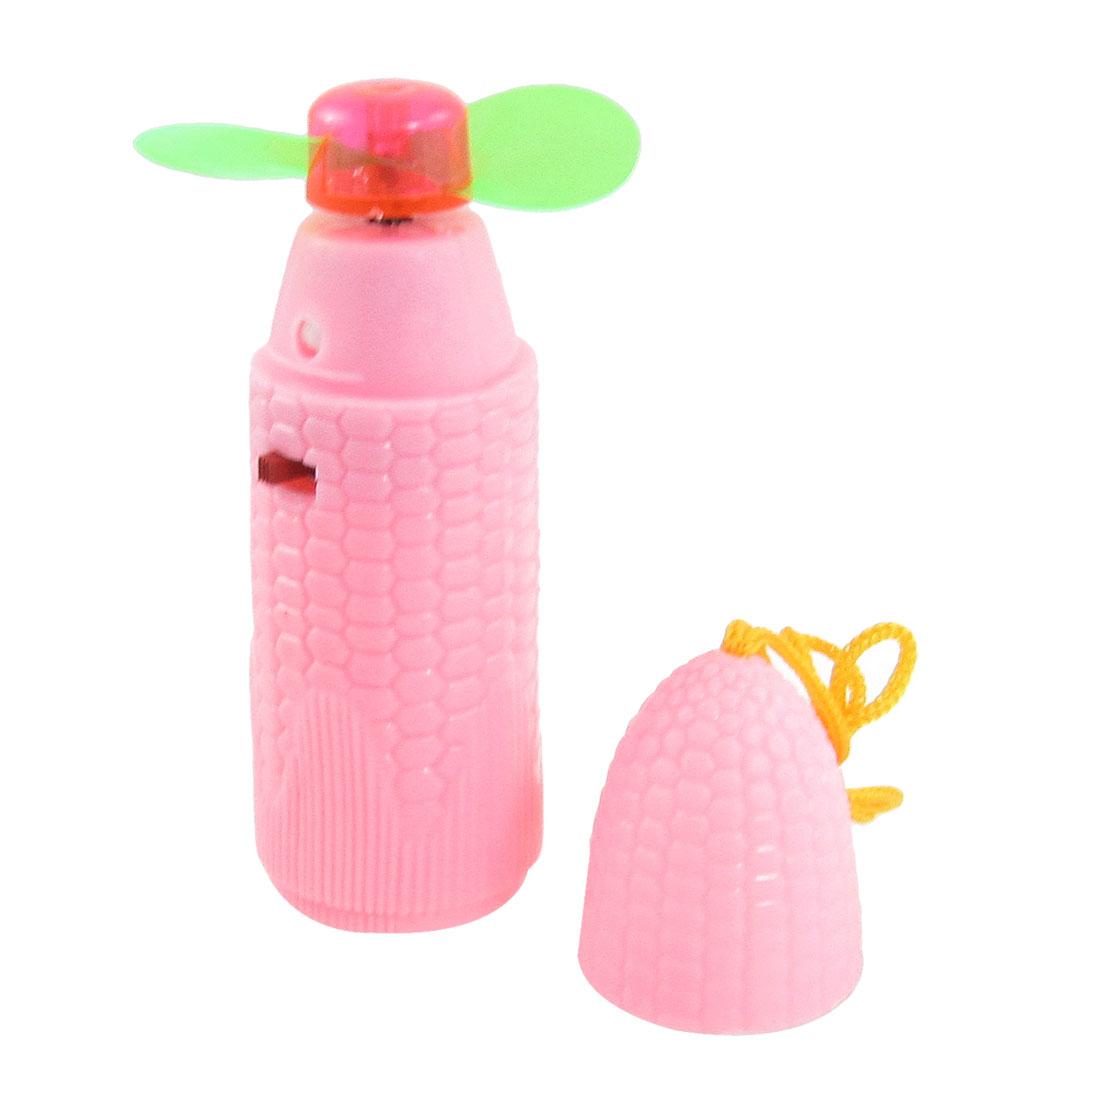 Portable Corn Shaped Battery Powered Mini Cooler Fan Pink